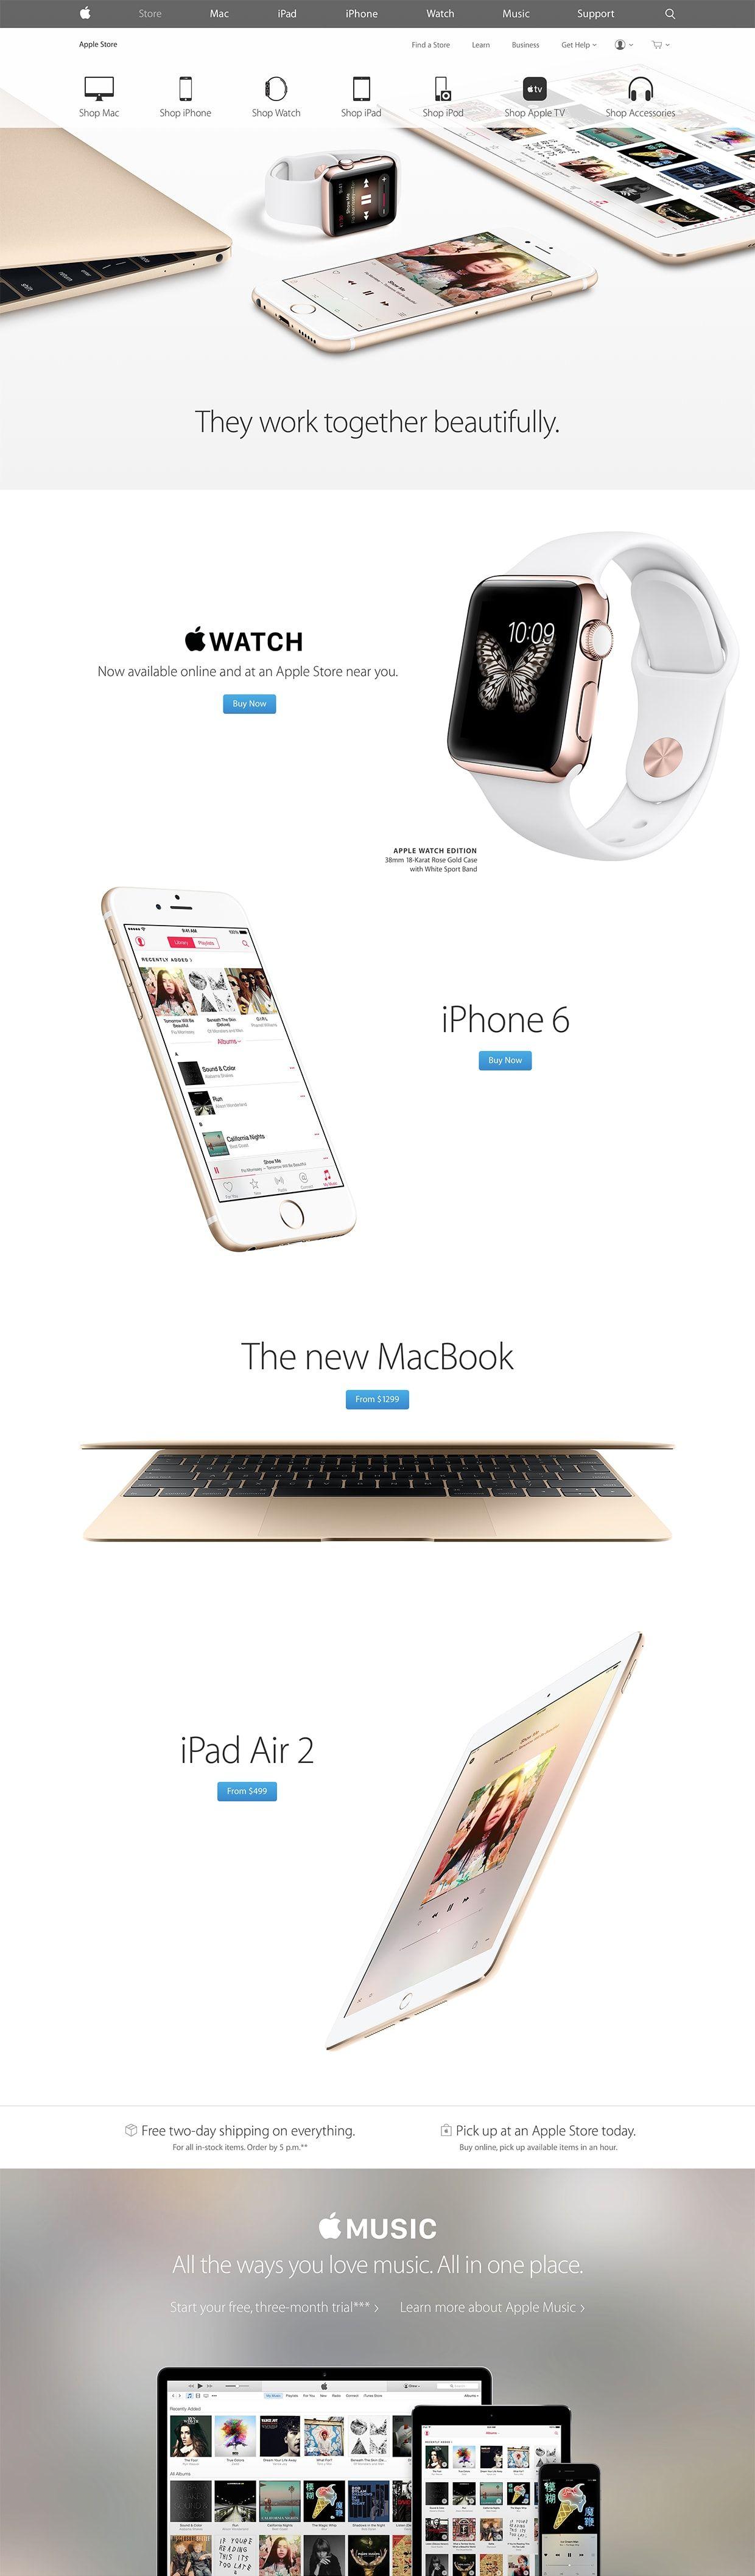 Apple Landing Page Design Inspiration Lapa Ninja Apple Design Ecommerce Web Design Landing Page Design